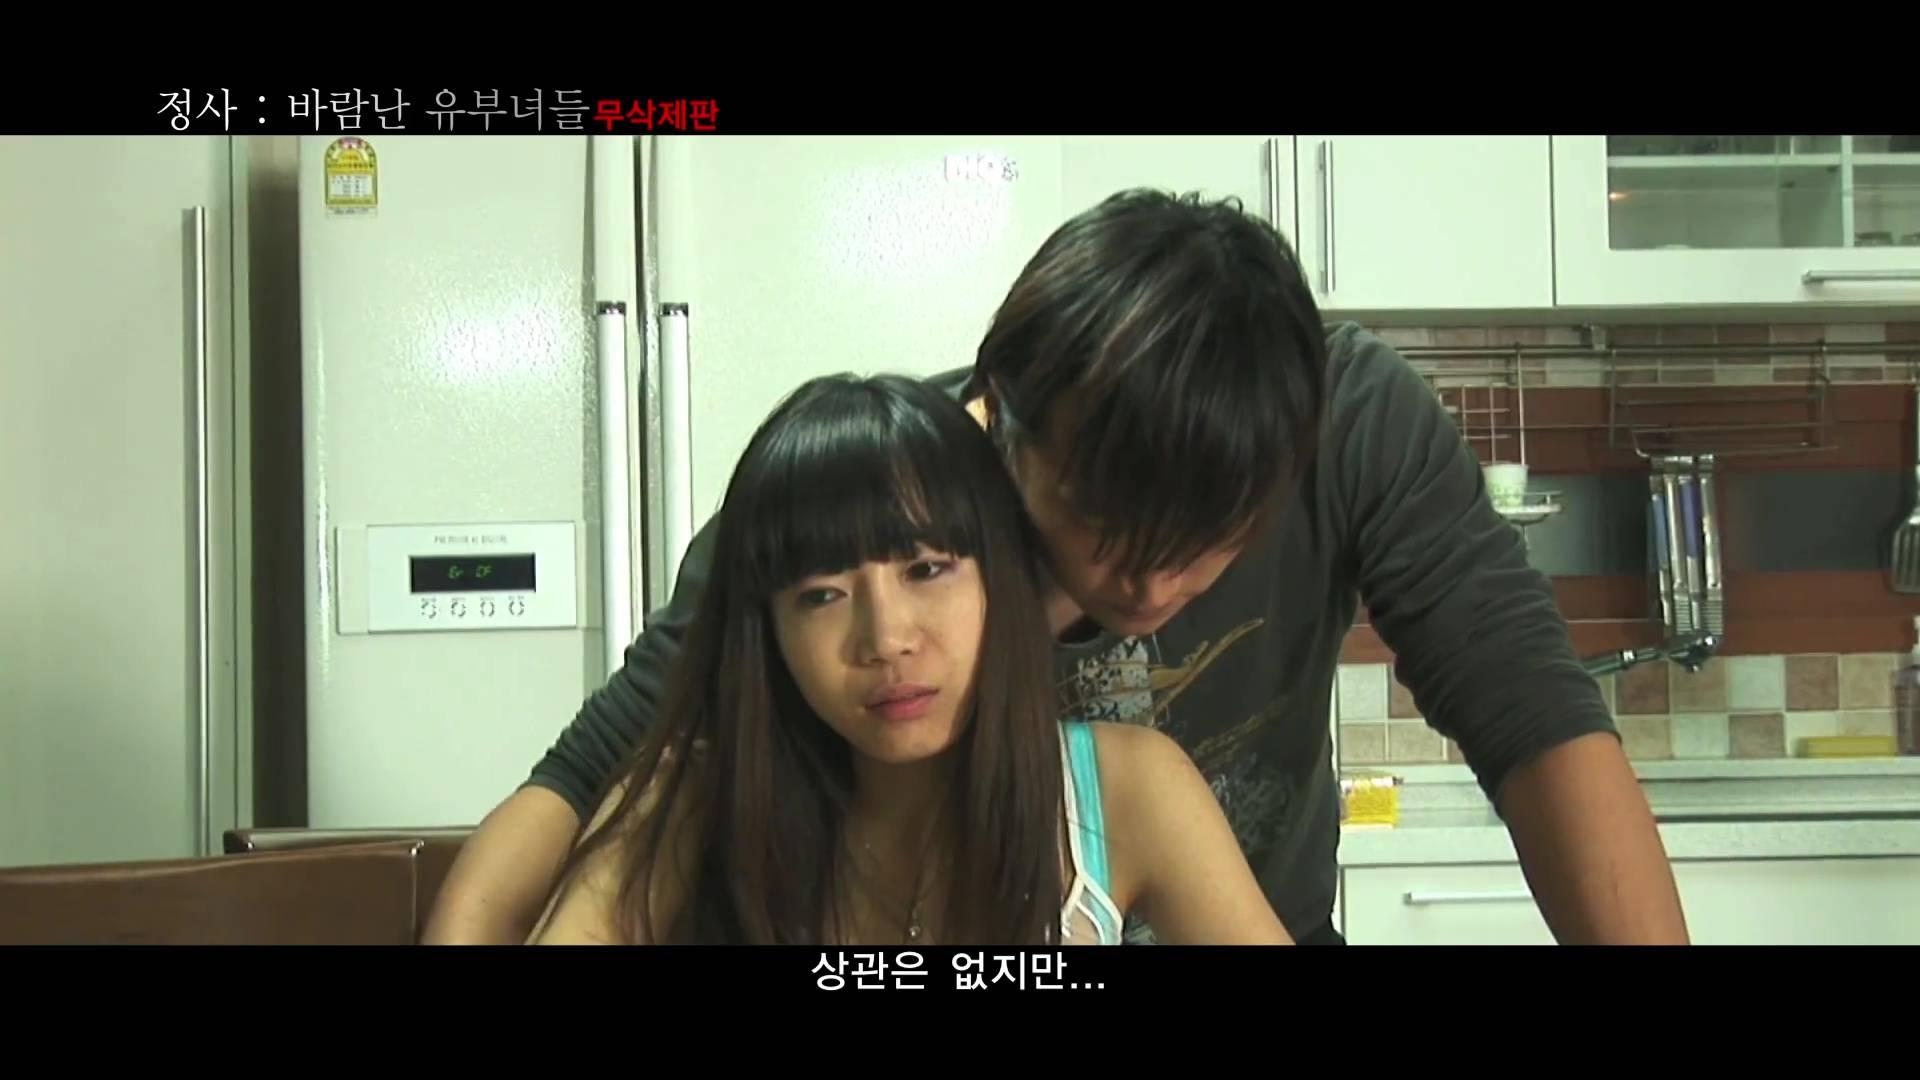 Rules of dating korean movie trailer